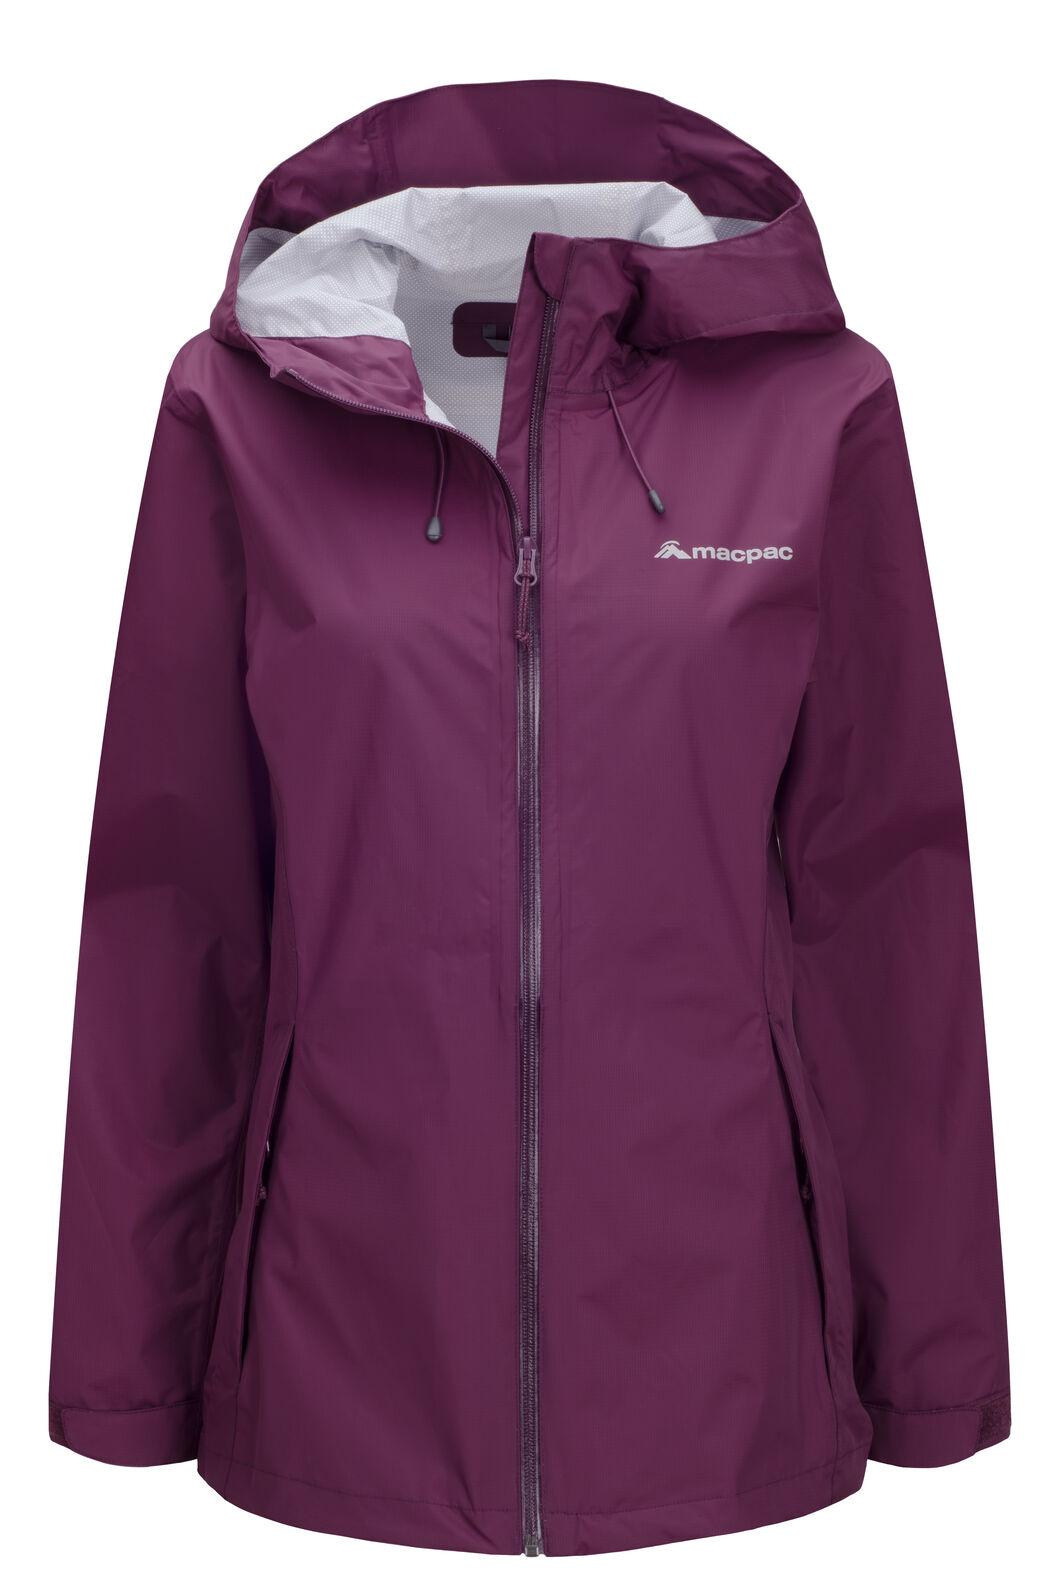 Macpac Women's Mistral Rain Jacket, Grape Wine, hi-res